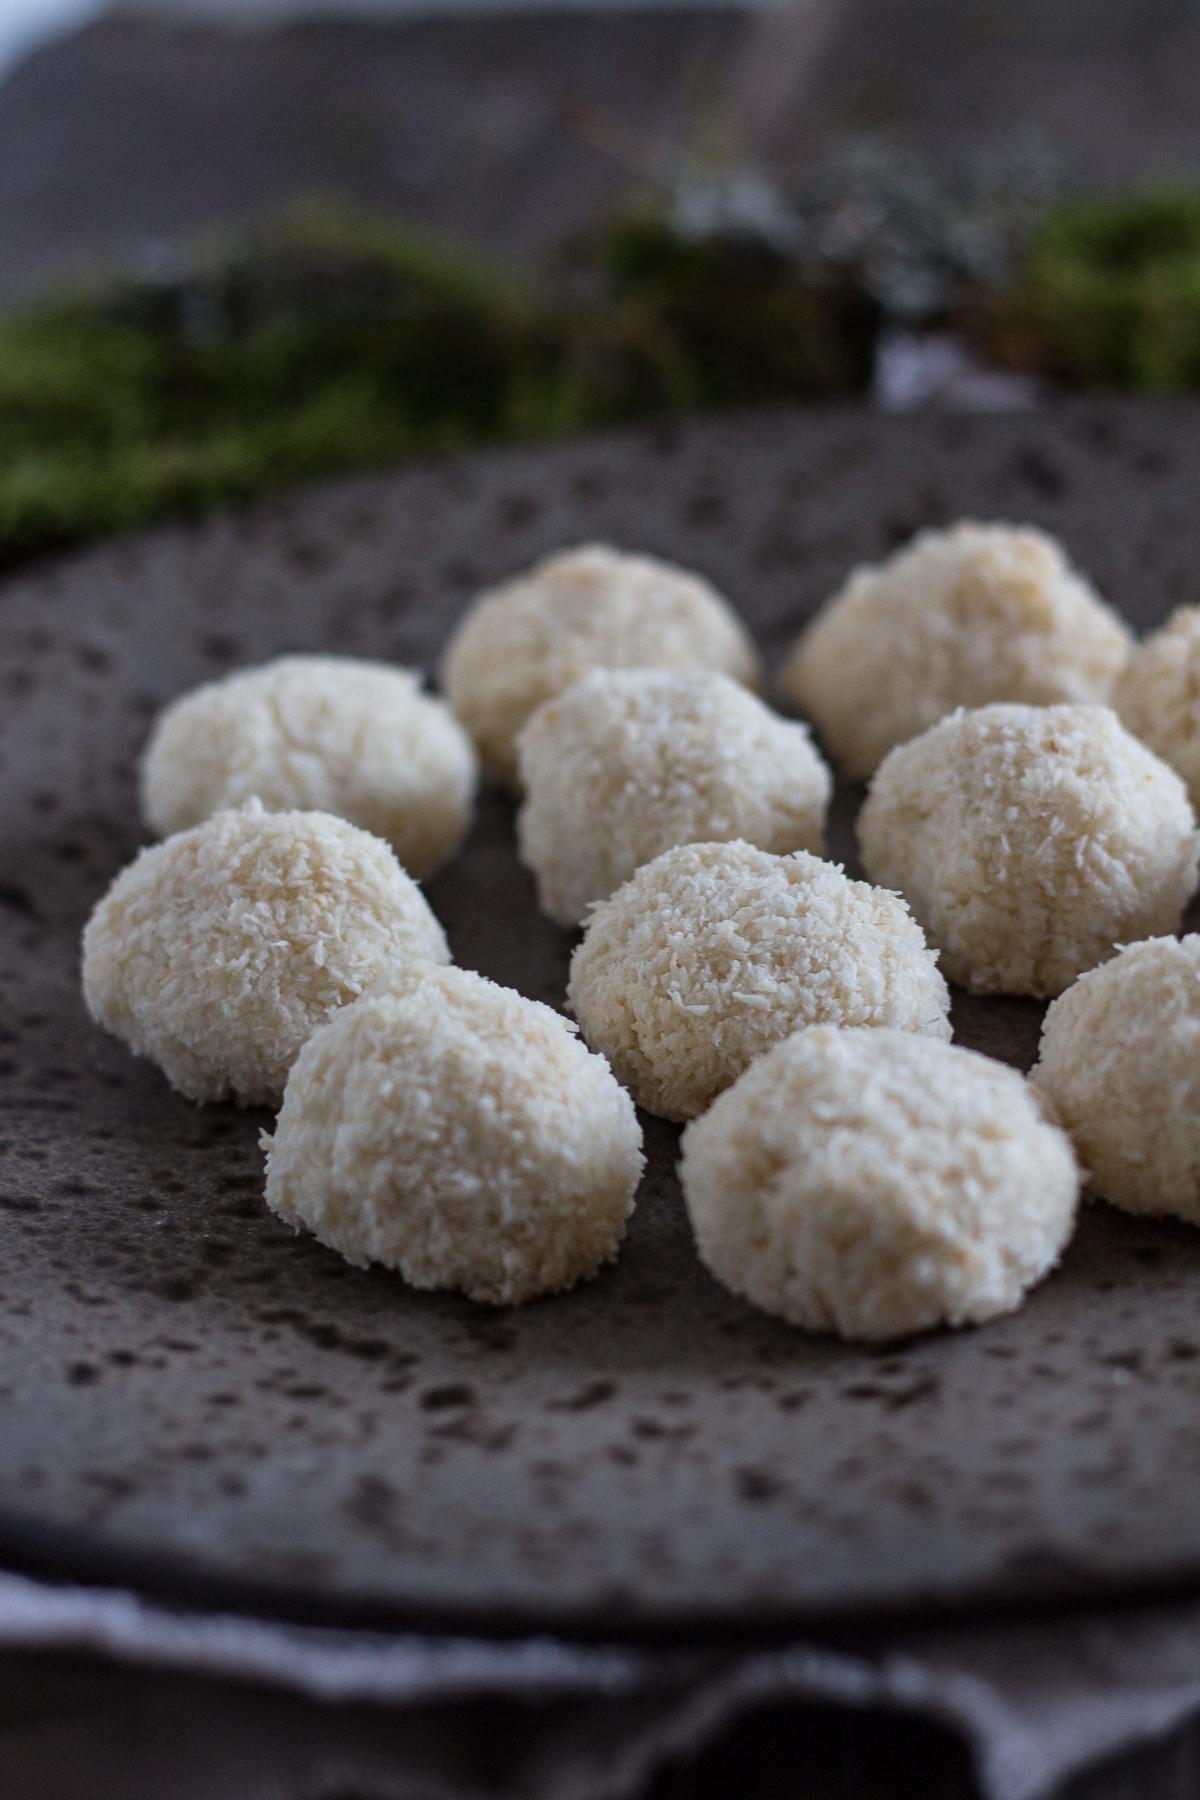 Die besten & saftigsten Kokosmakronen